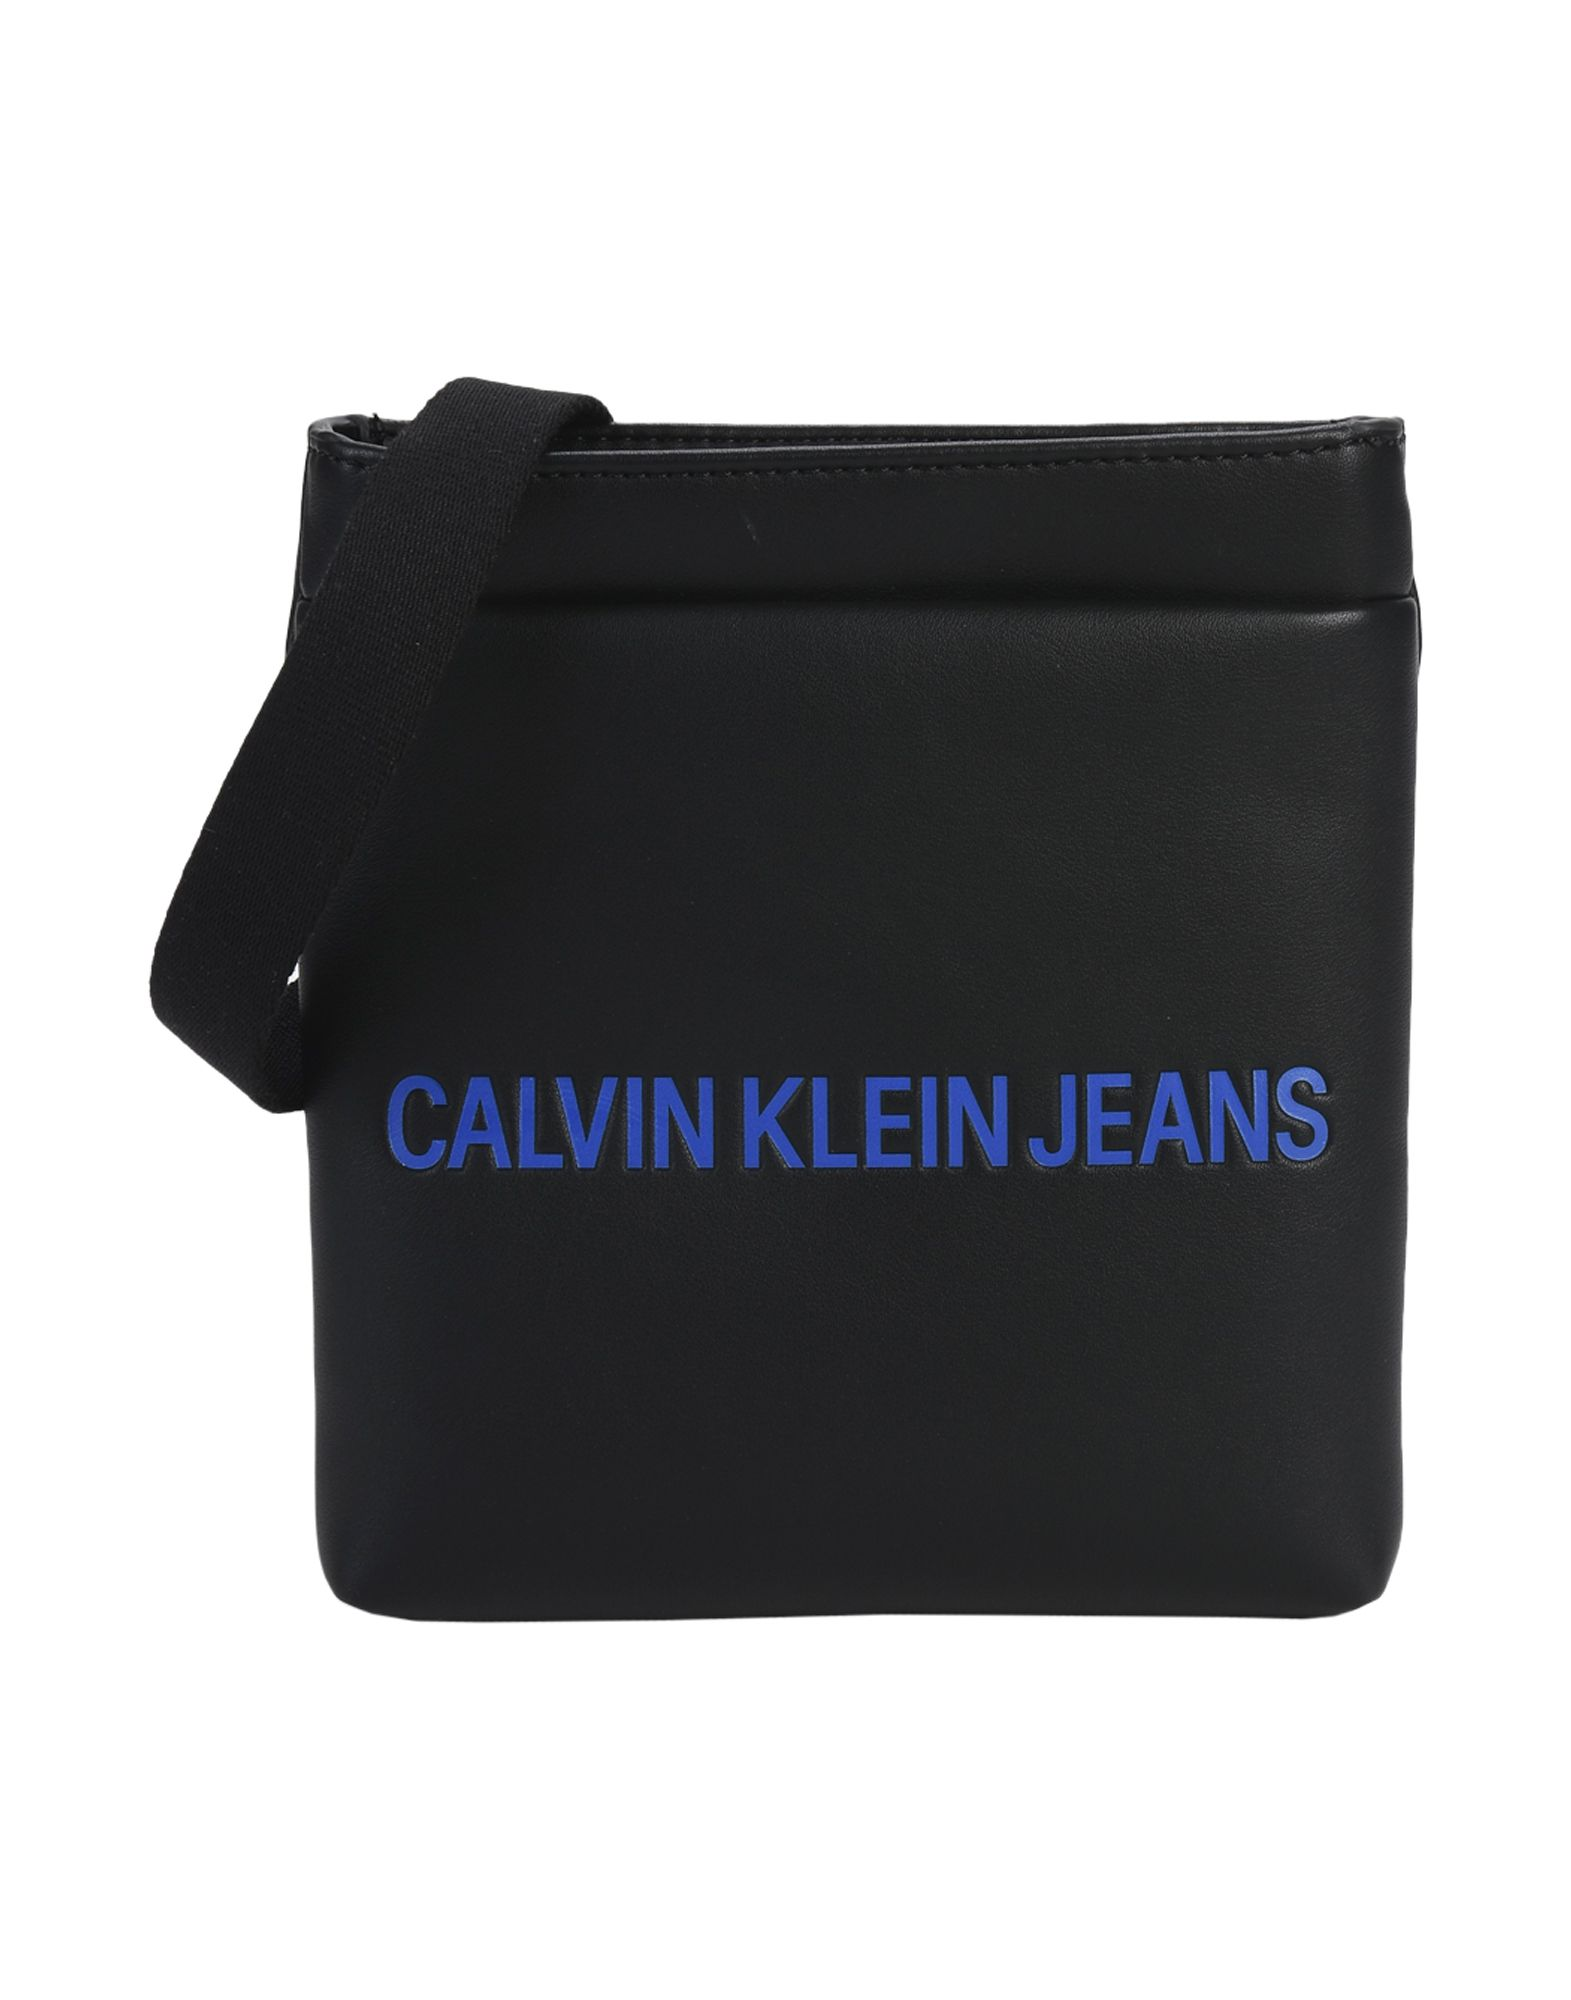 CALVIN KLEIN JEANS Сумка через плечо кошелек calvin klein jeans calvin klein jeans ca939bwapqt1